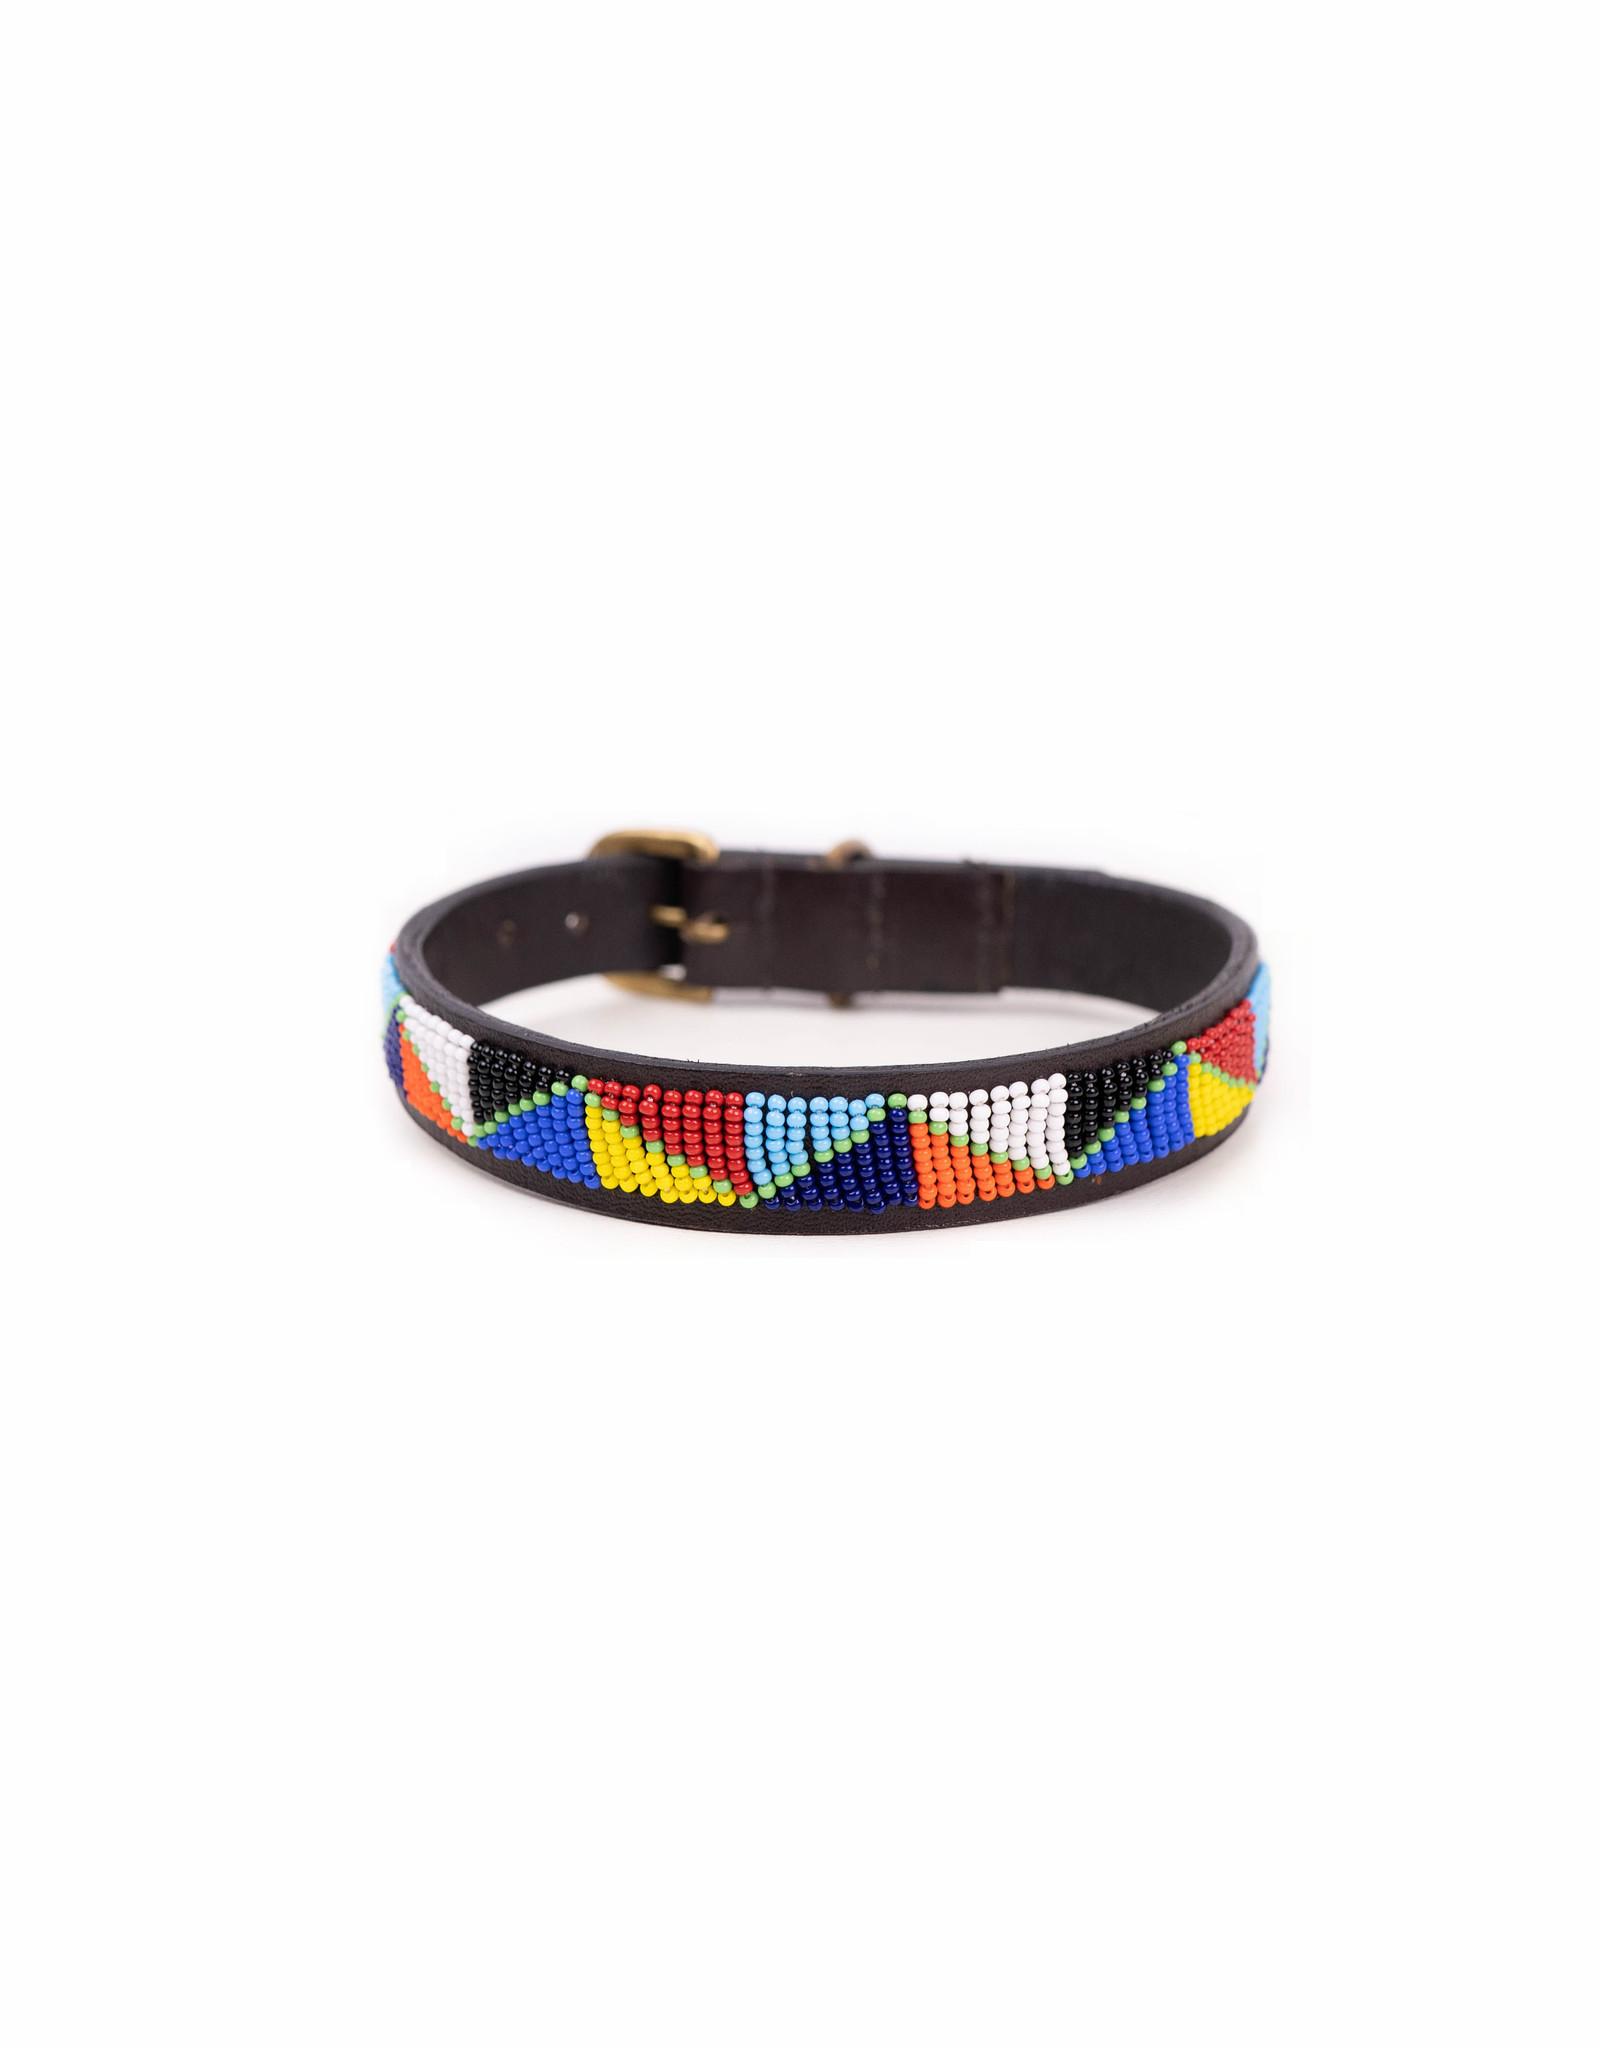 Maisha.Style Dog collar - Maasai triangles on brown leather